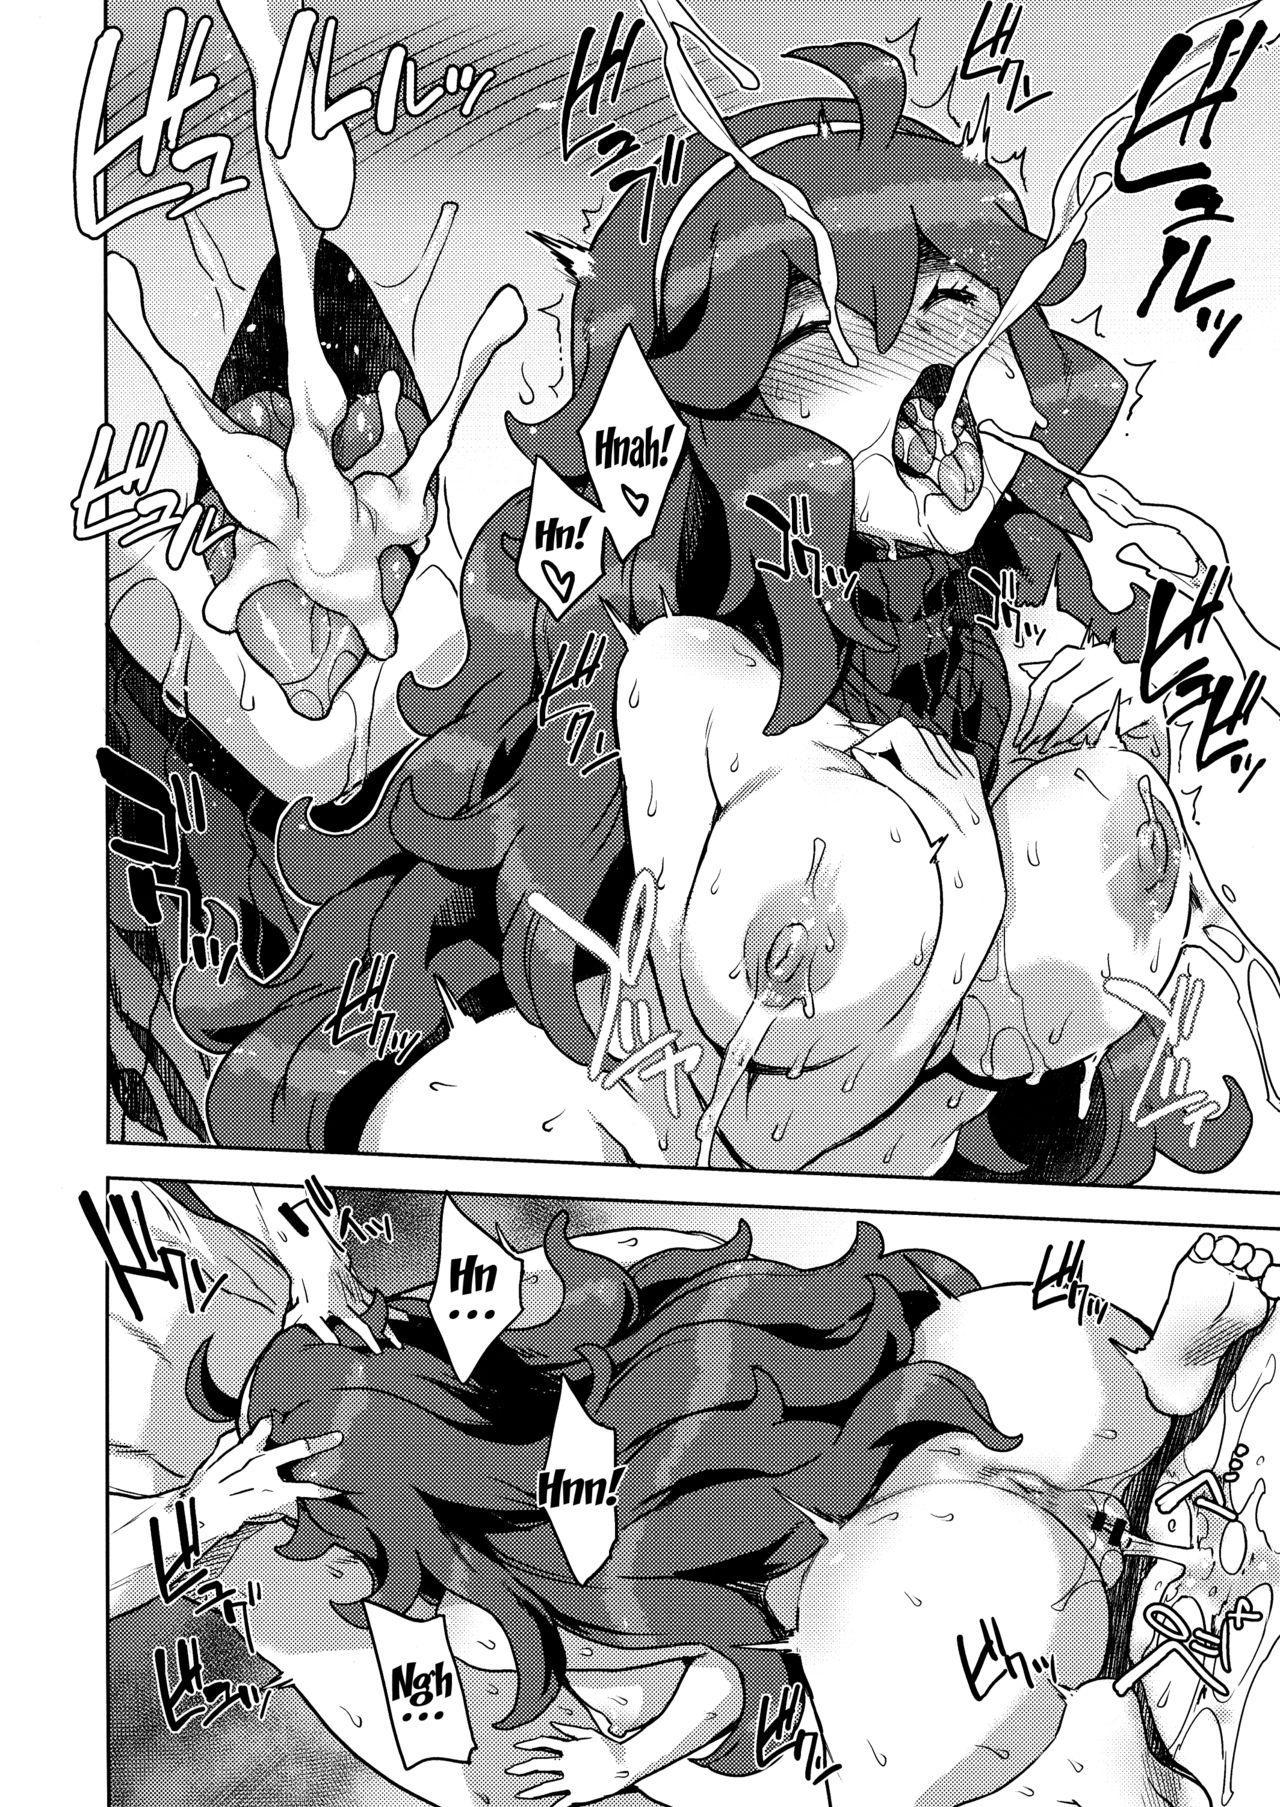 Occult Mania-chan no Milk Factory 15